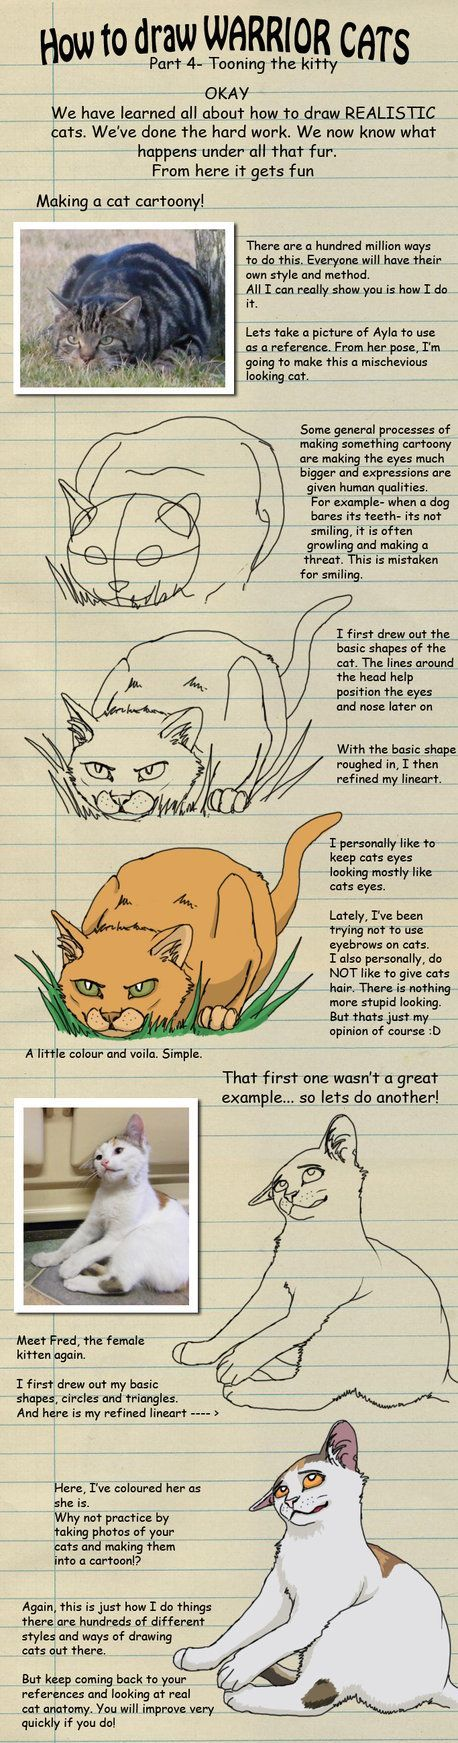 4b77100870e135ad970c4e493854ed6c.jpg | Как рисовать животных ...